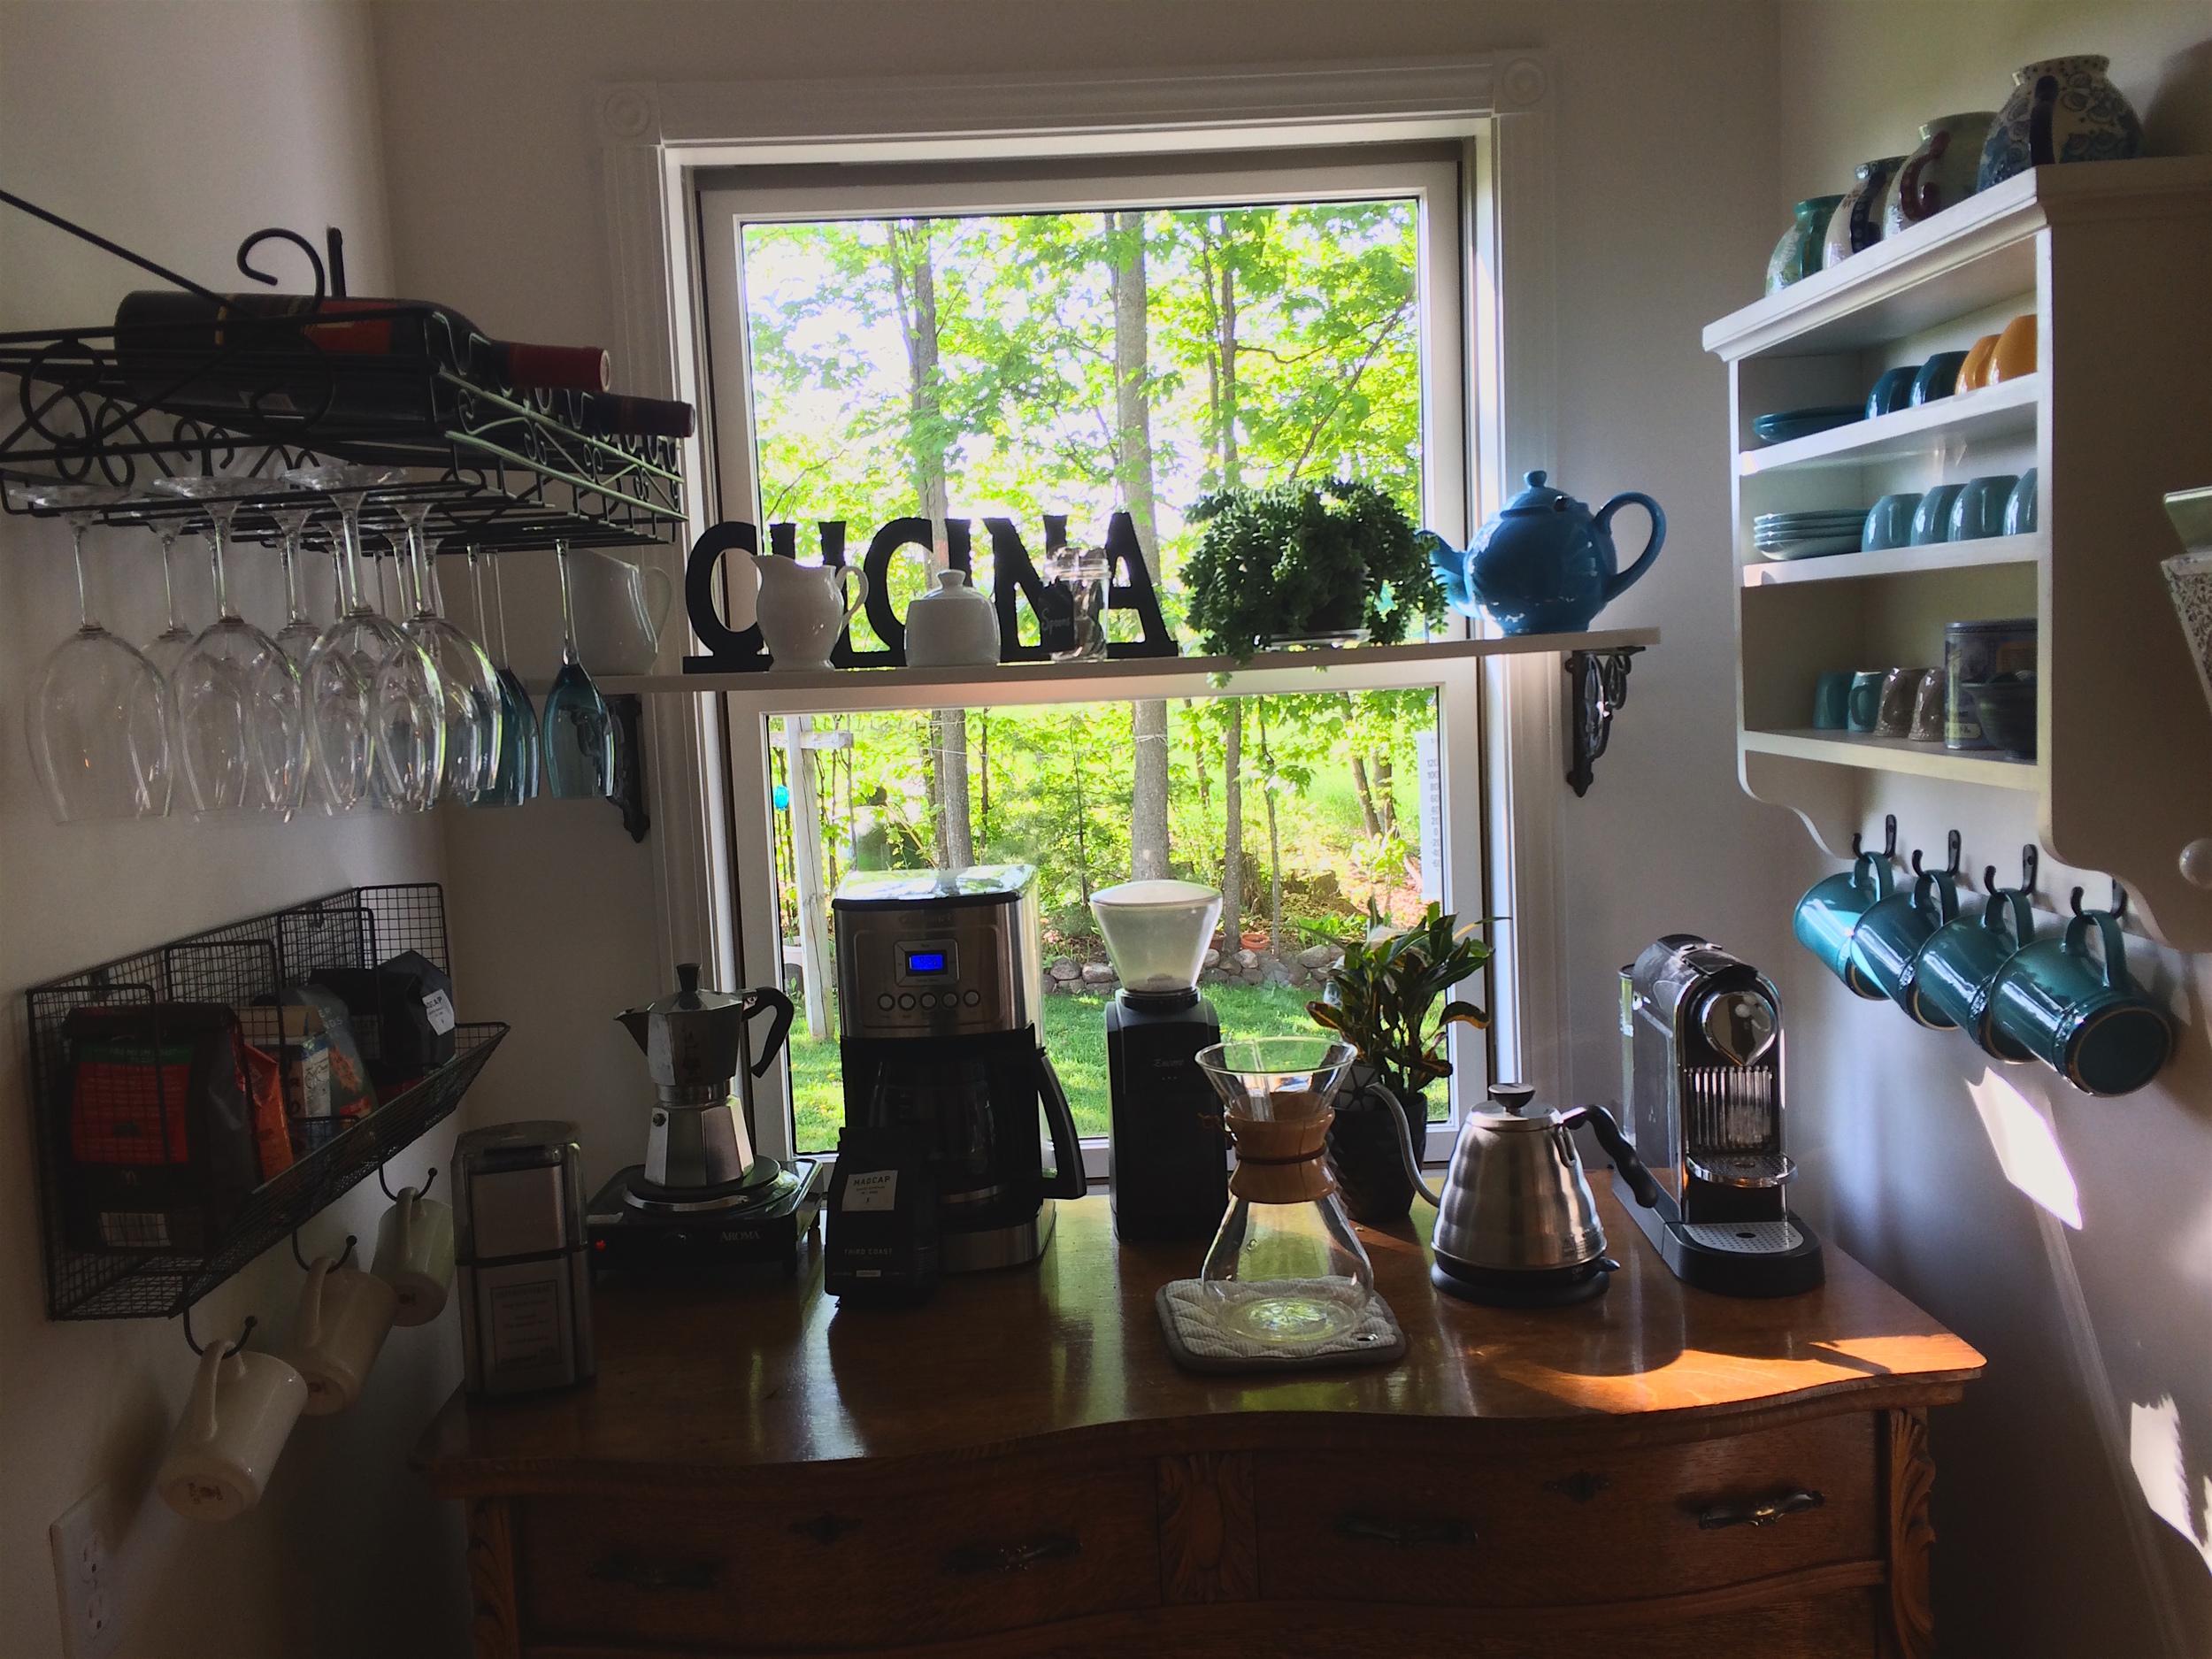 My mom's coffee bar. A nice mix of the Italian Moka pot on the left, an American drip coffee machine, Chemex, and a French Nespresso machine.